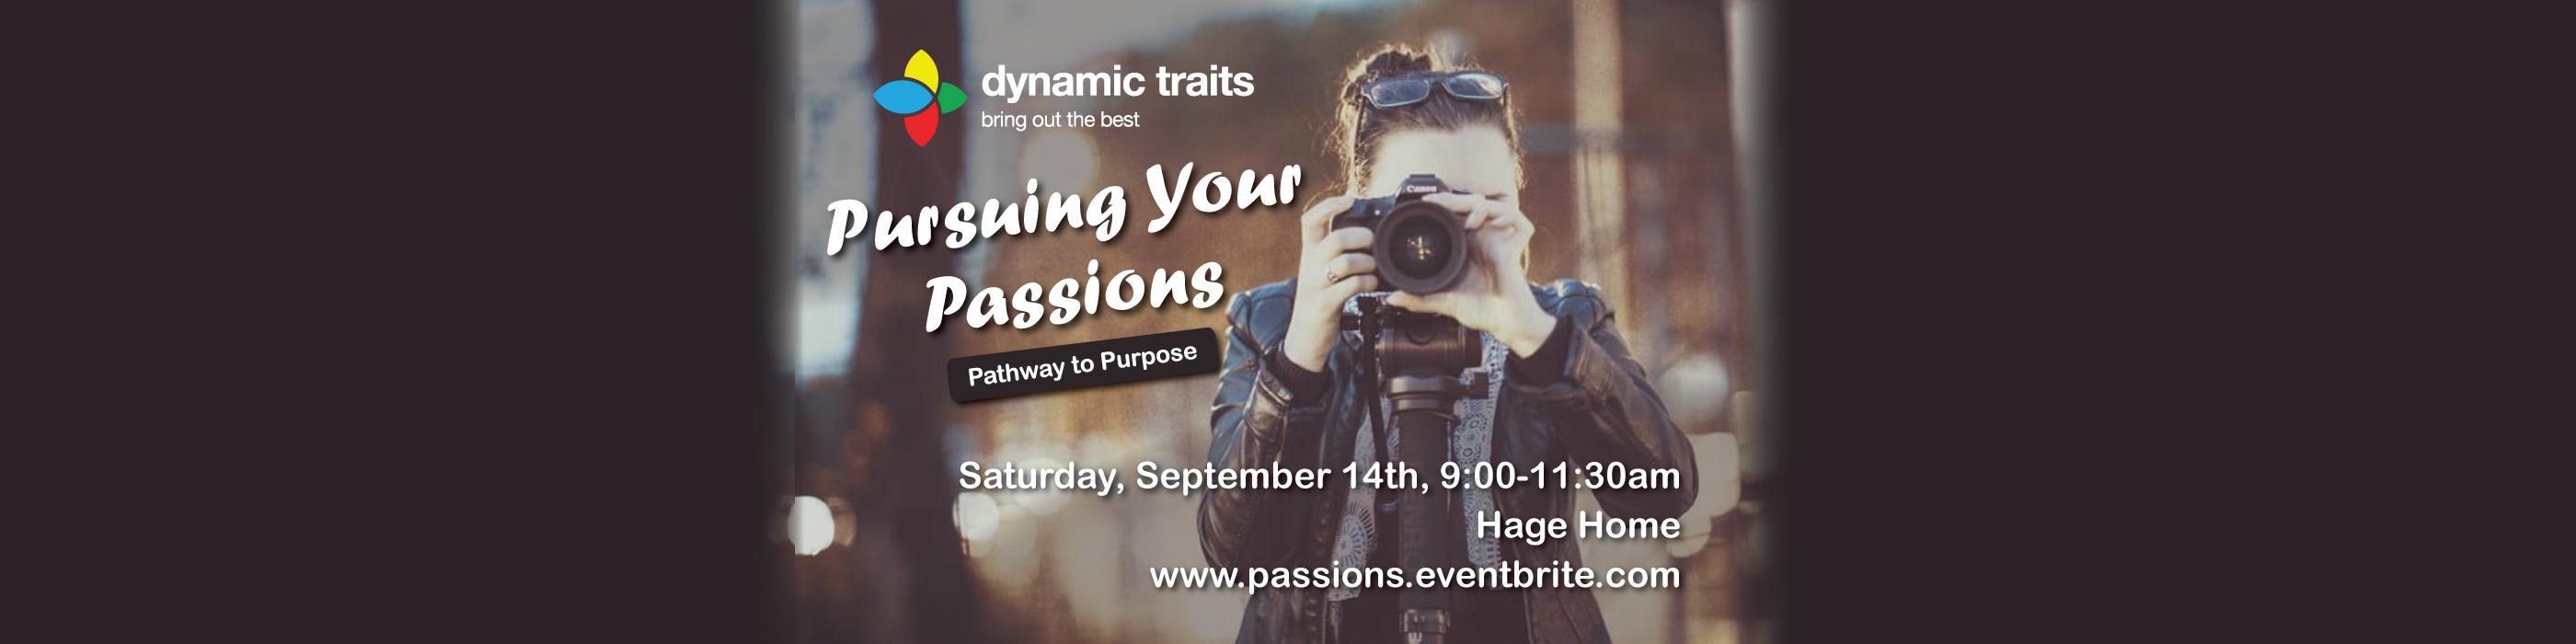 Pursuing-Your-Passions-2-091419-WEB-2800x700